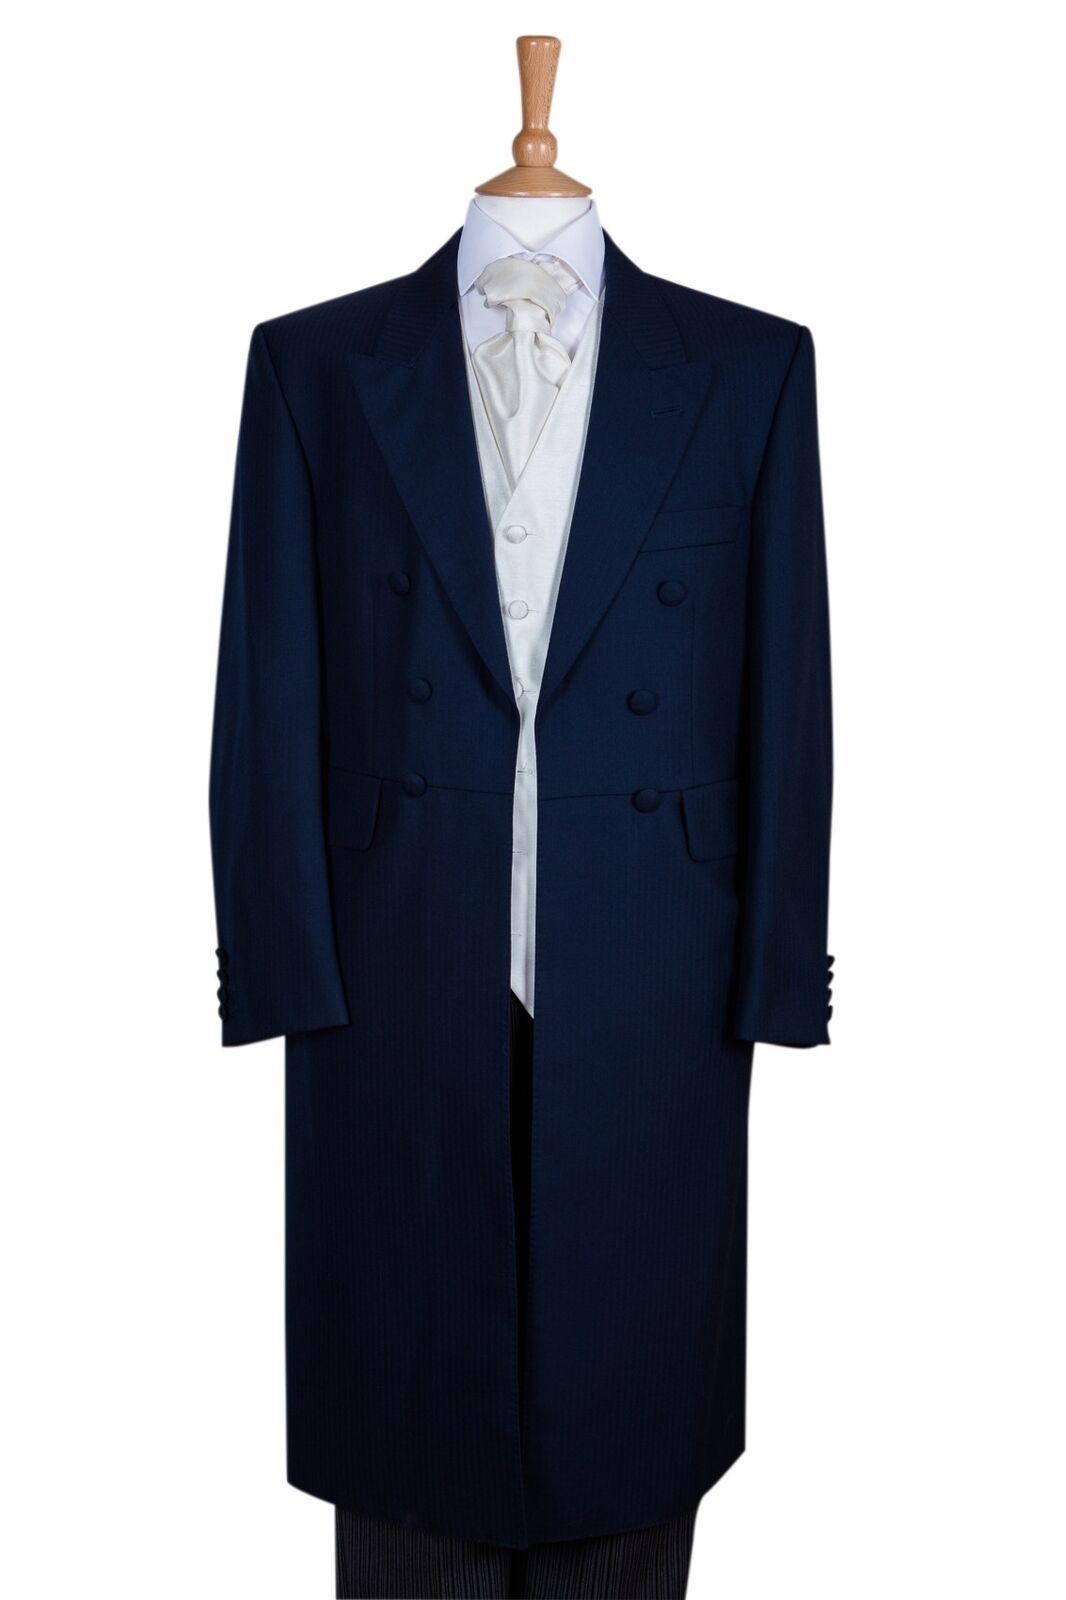 Three Piece Navy Blau Frockcoat, Waistcoat & Trousers - Ex Hire